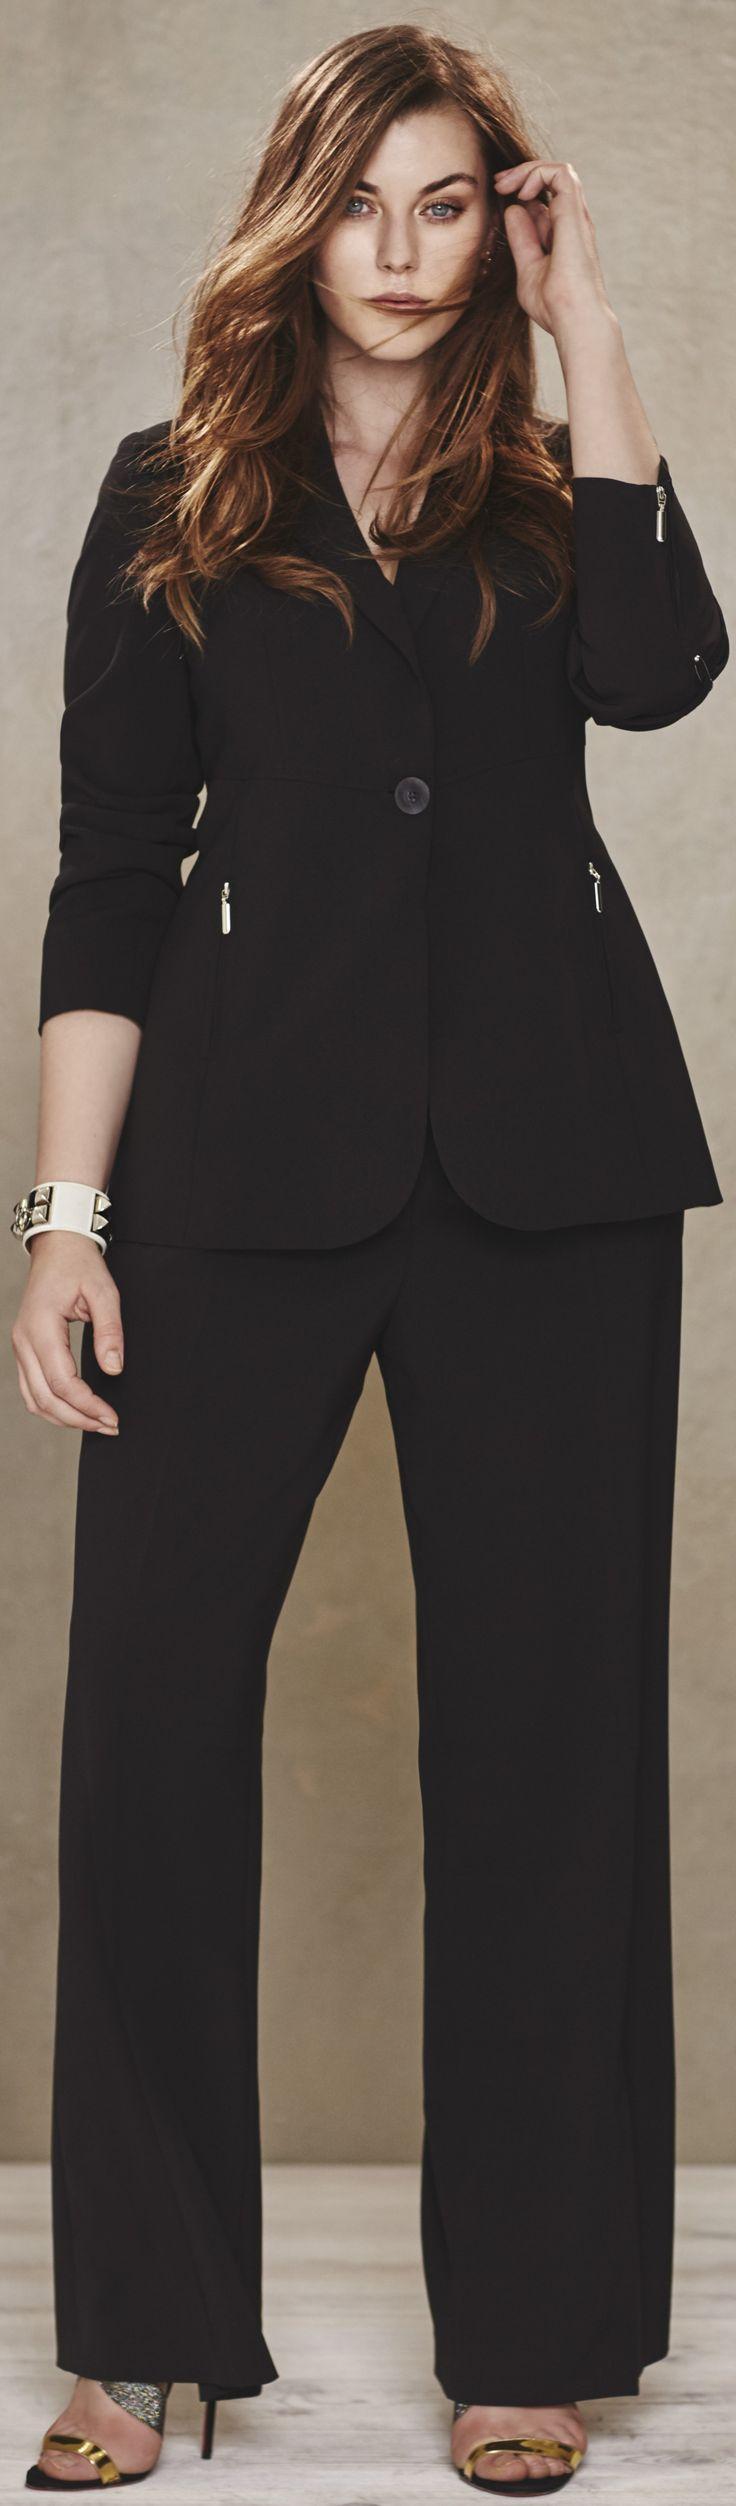 Petite plus size pants for women. Fashion tips & websites to try: http://www.boomerinas.com/2015/10/04/petite-plus-size-brands-womens-fashion-tips-for-cruisewear-casual-wear-eveningwear/